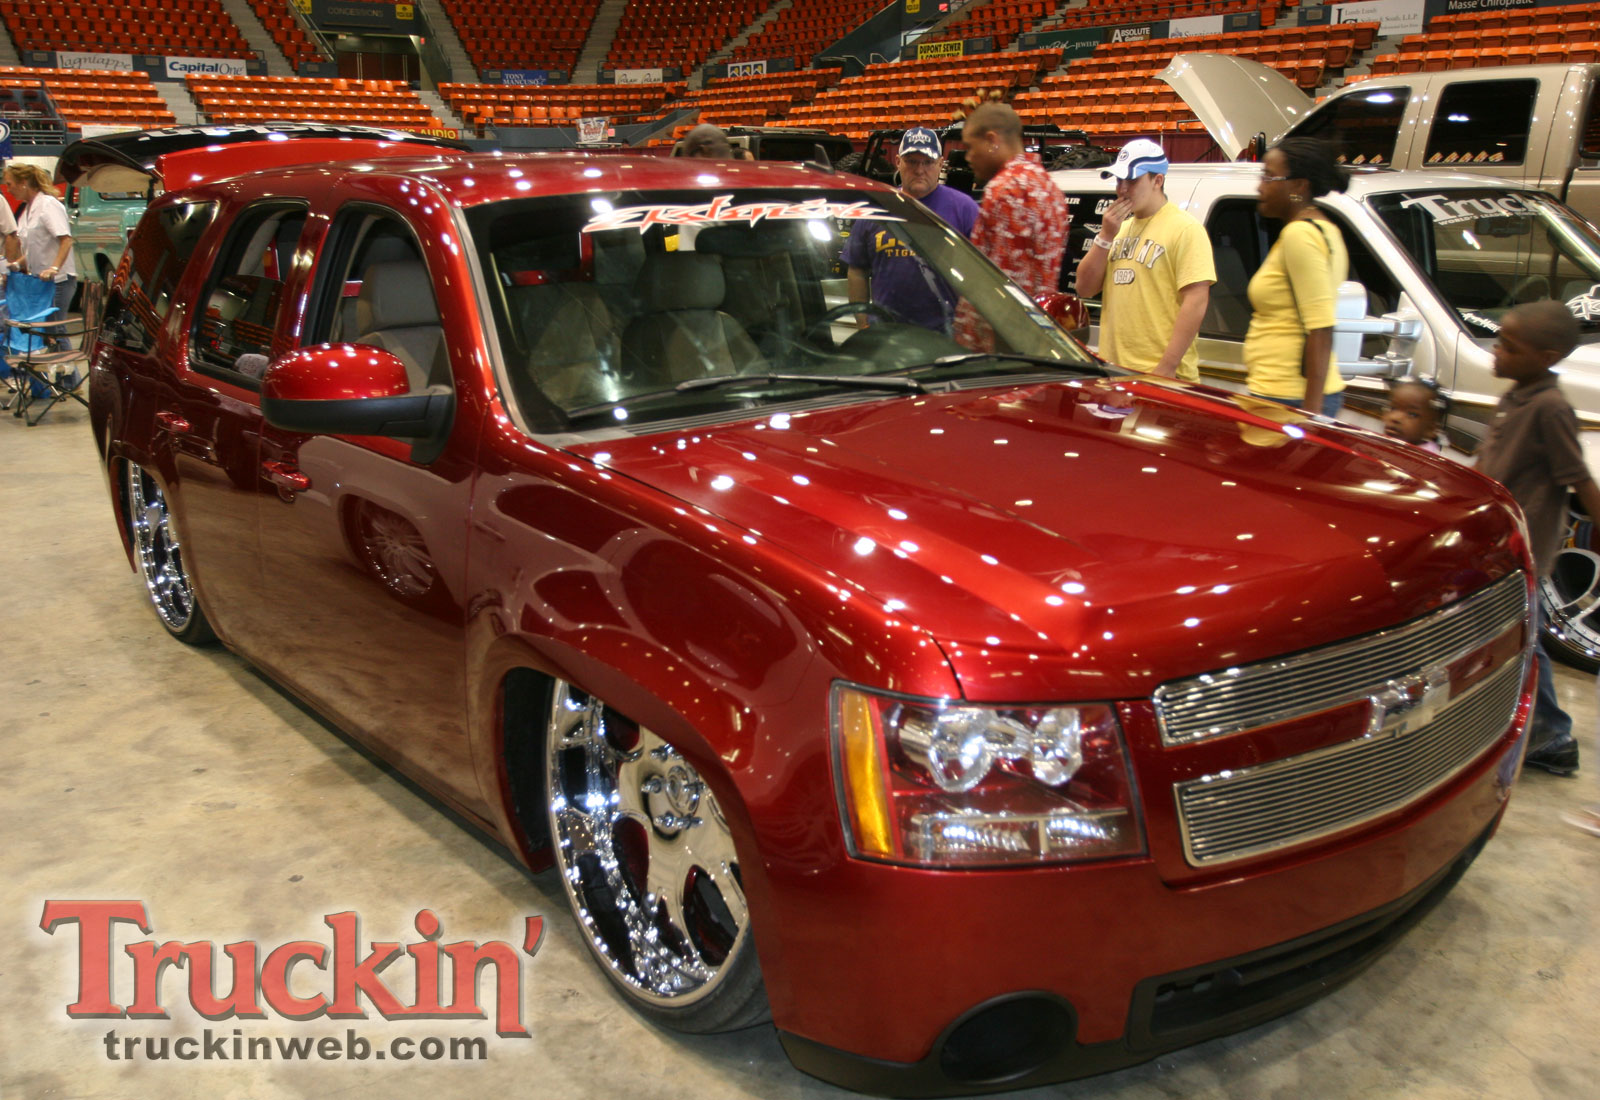 1004trweb_68+2010_midnight_fantasies_truck_show+custom_chevy_tahoe.jpg